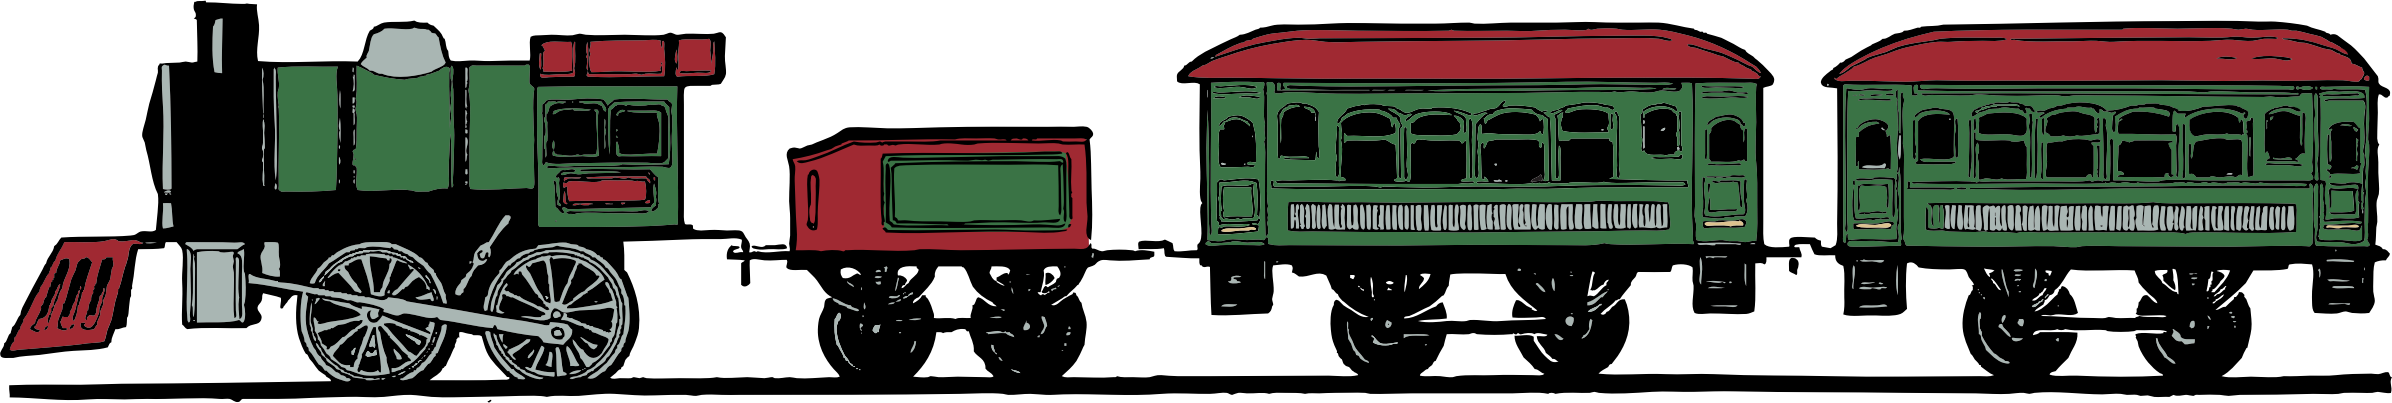 Passenger train car clipart jpg transparent download Clipart - color toy train set jpg transparent download